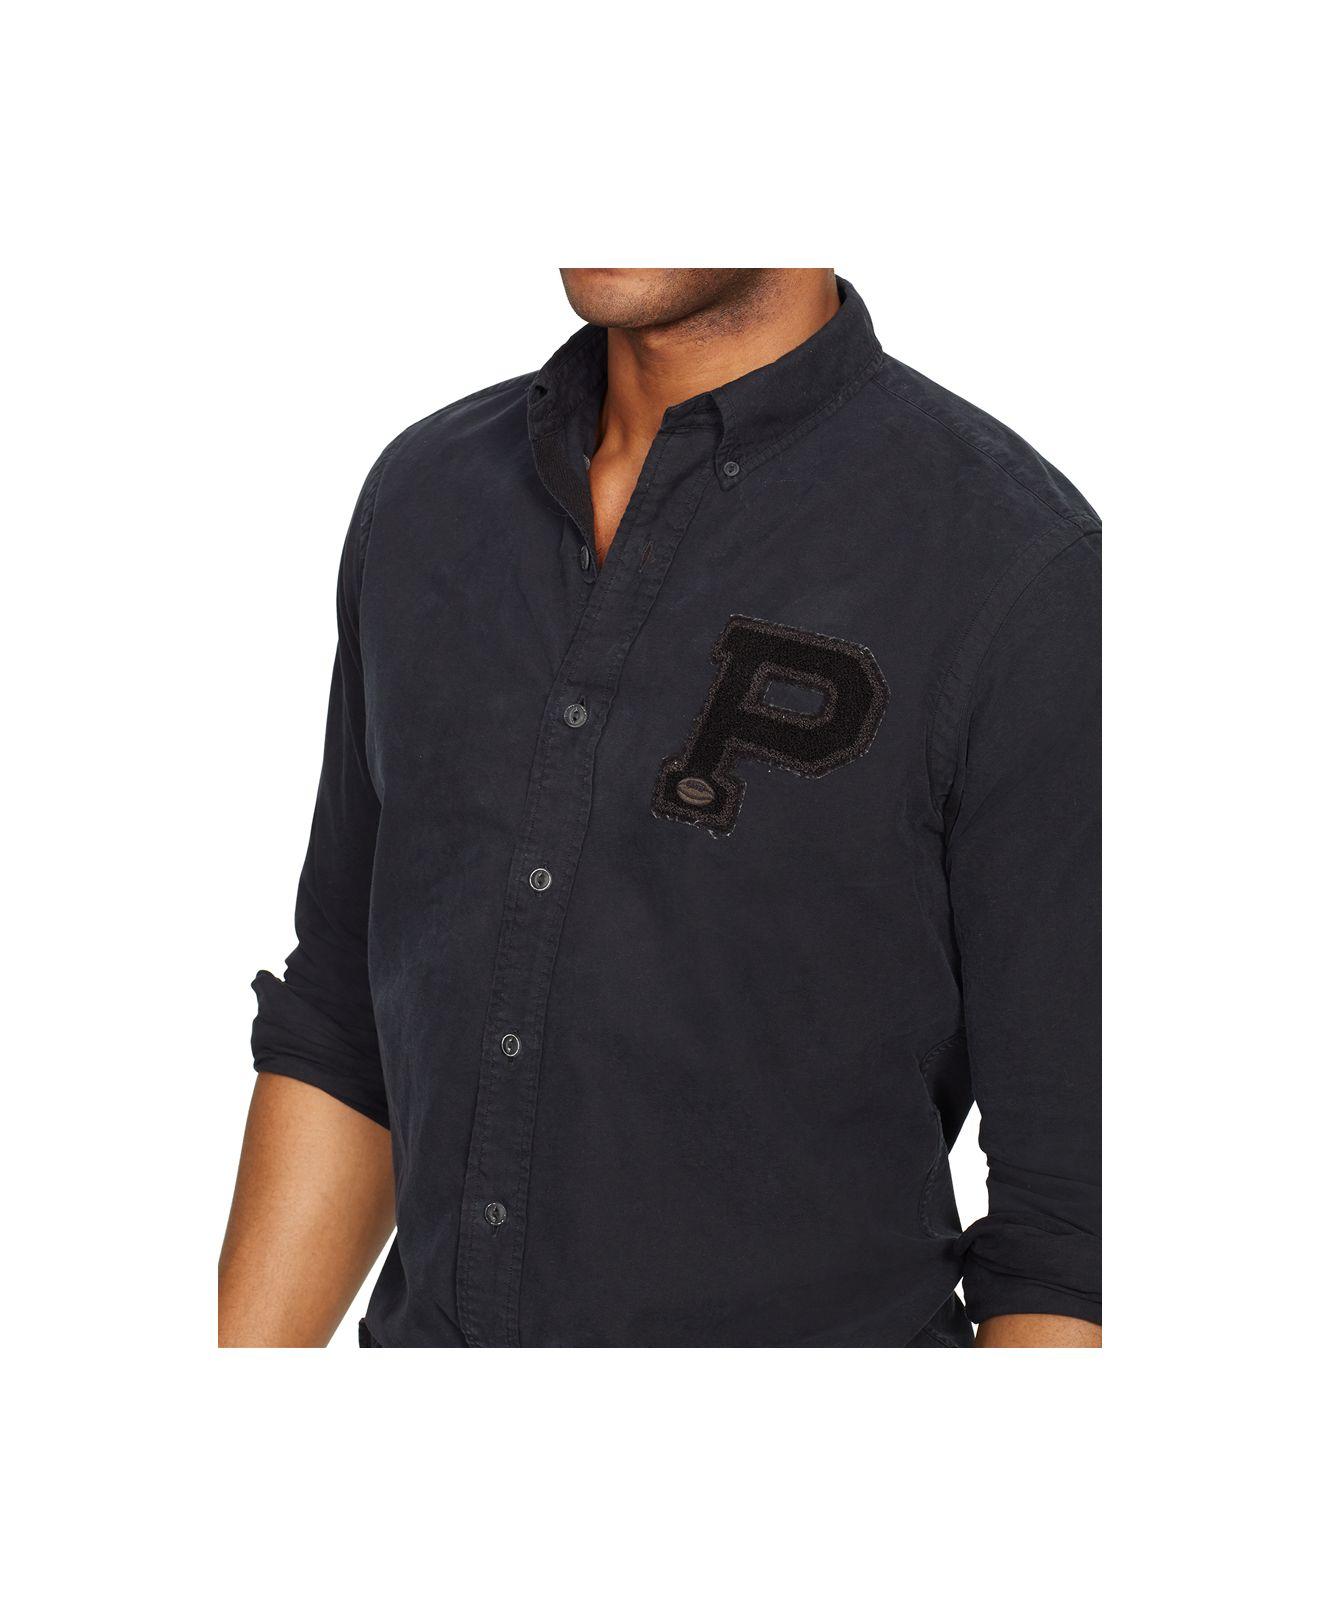 Lyst Polo Ralph Lauren Oxford Bulldog Shirt In Black For Men